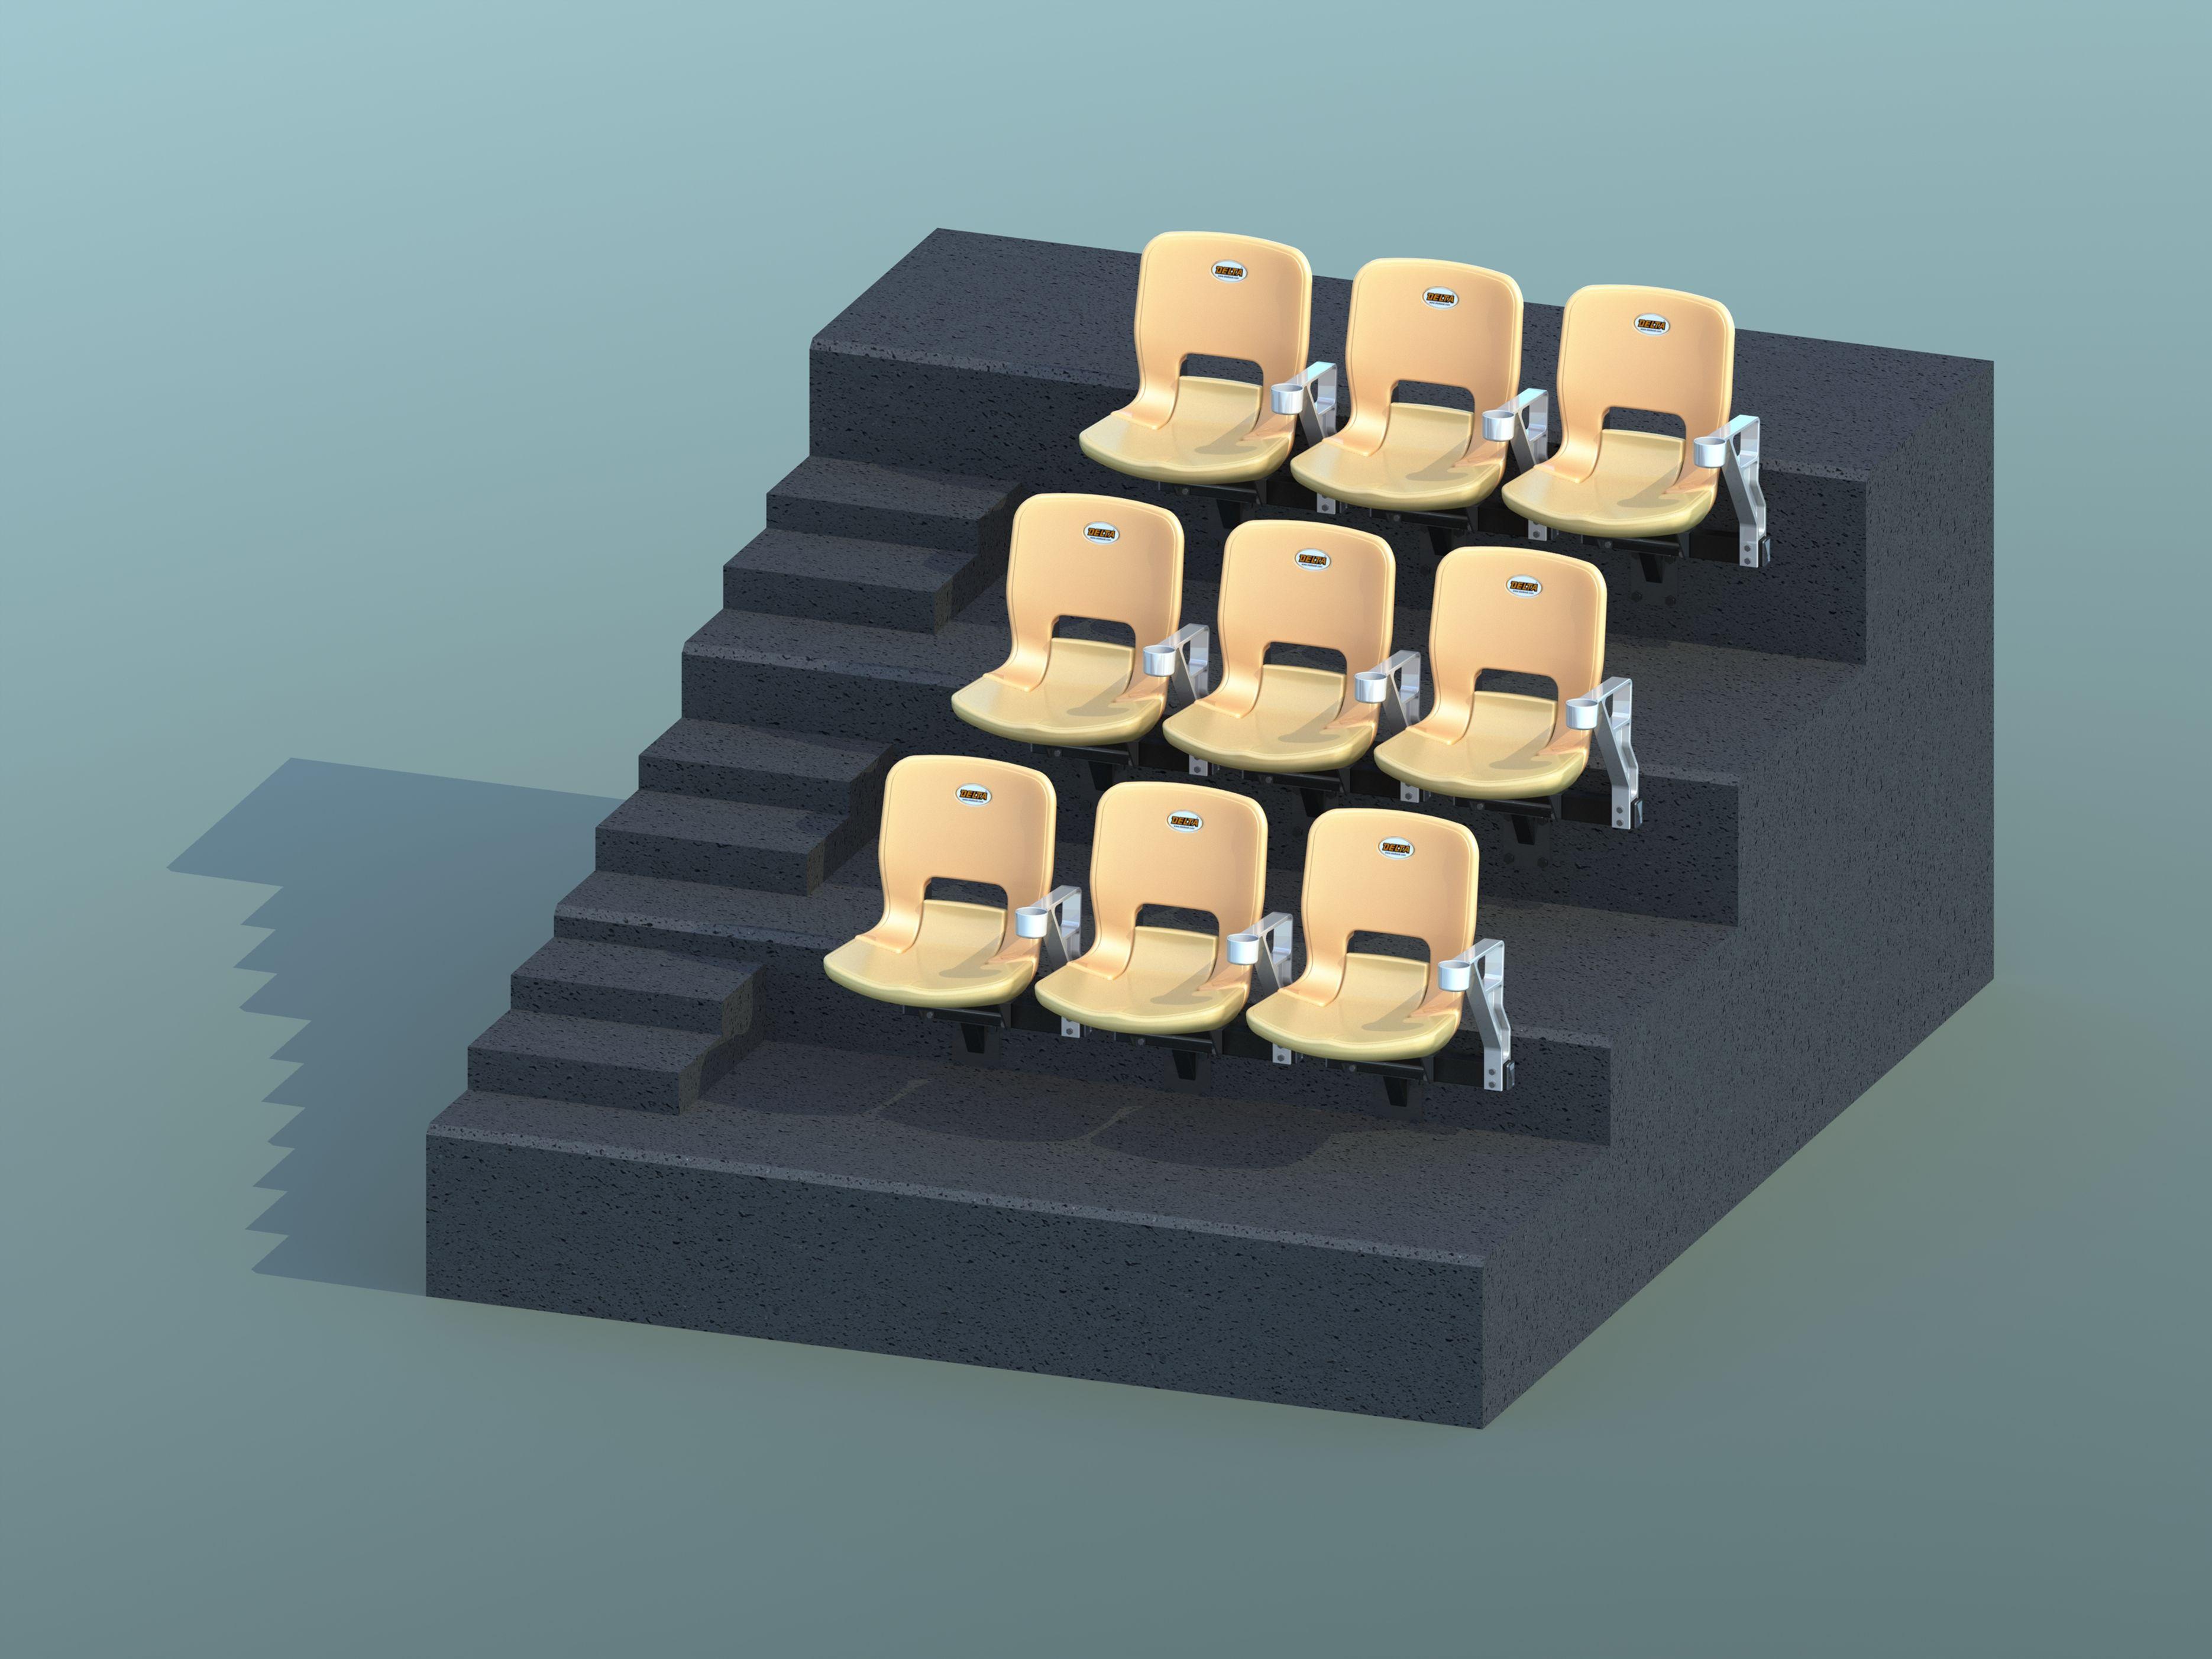 linea_backrest_monoblock_copolymer_pp_stadium_chair_seatorium_11